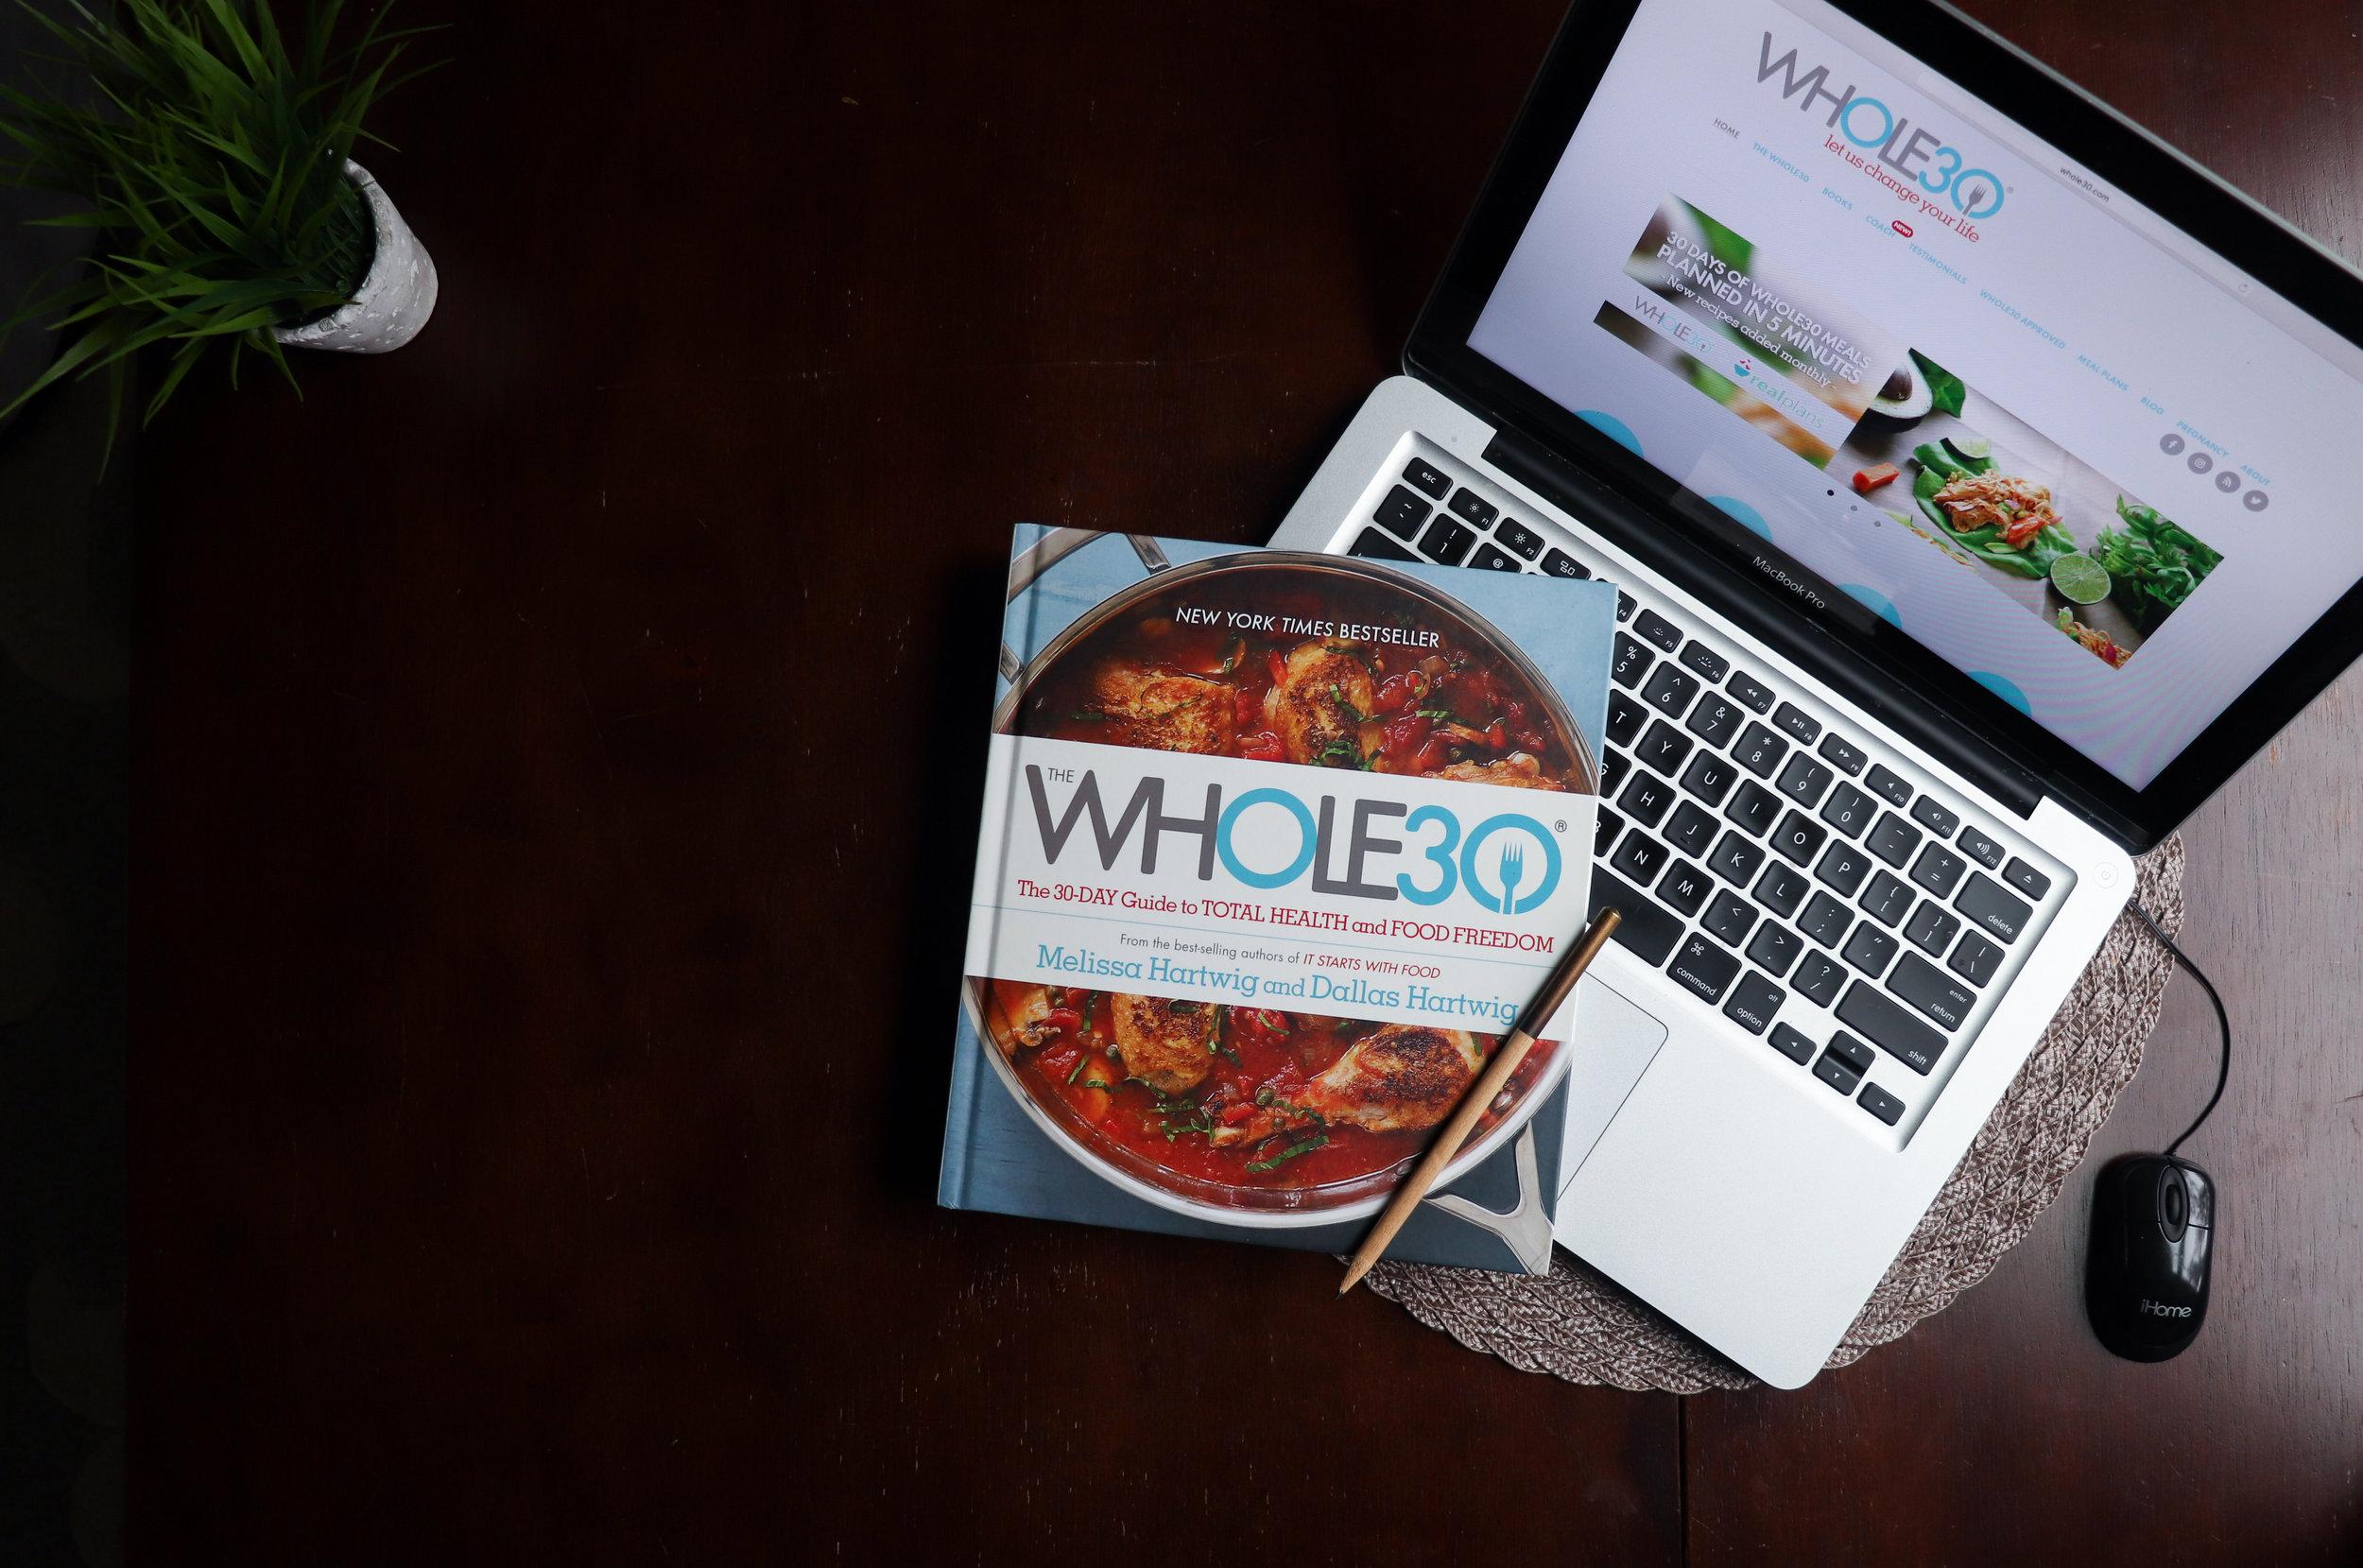 Whole30 with laptop landscape.jpg